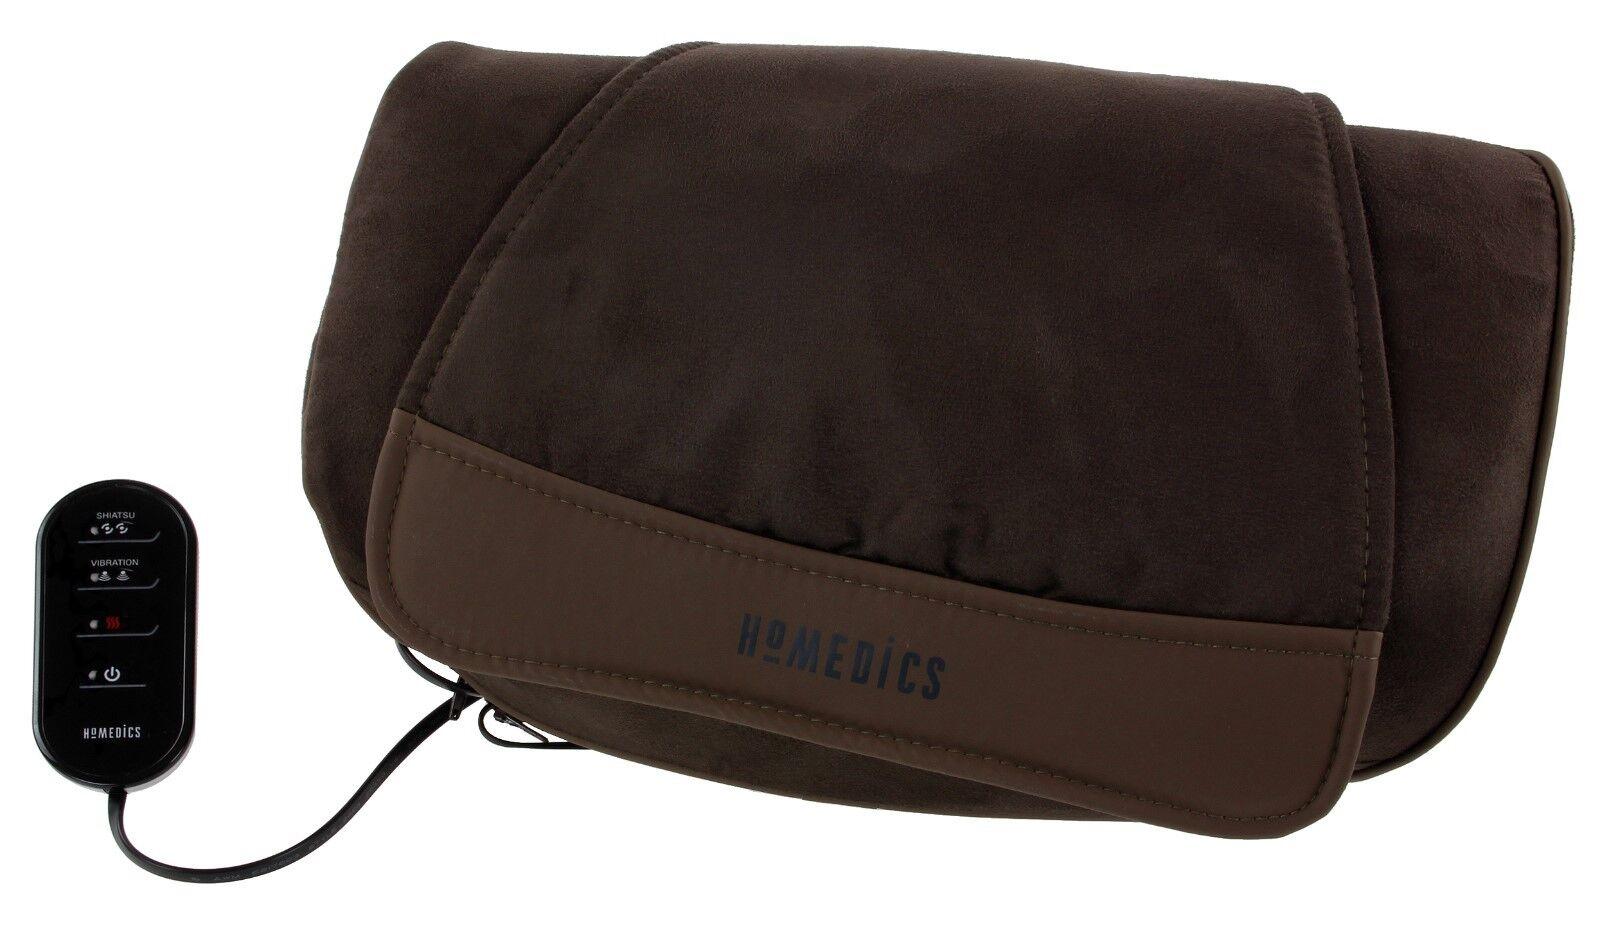 Homedics Deluxe Shiatsu, Vibration & Heat Massage Cushion Legs Back Neck Sp-39hw